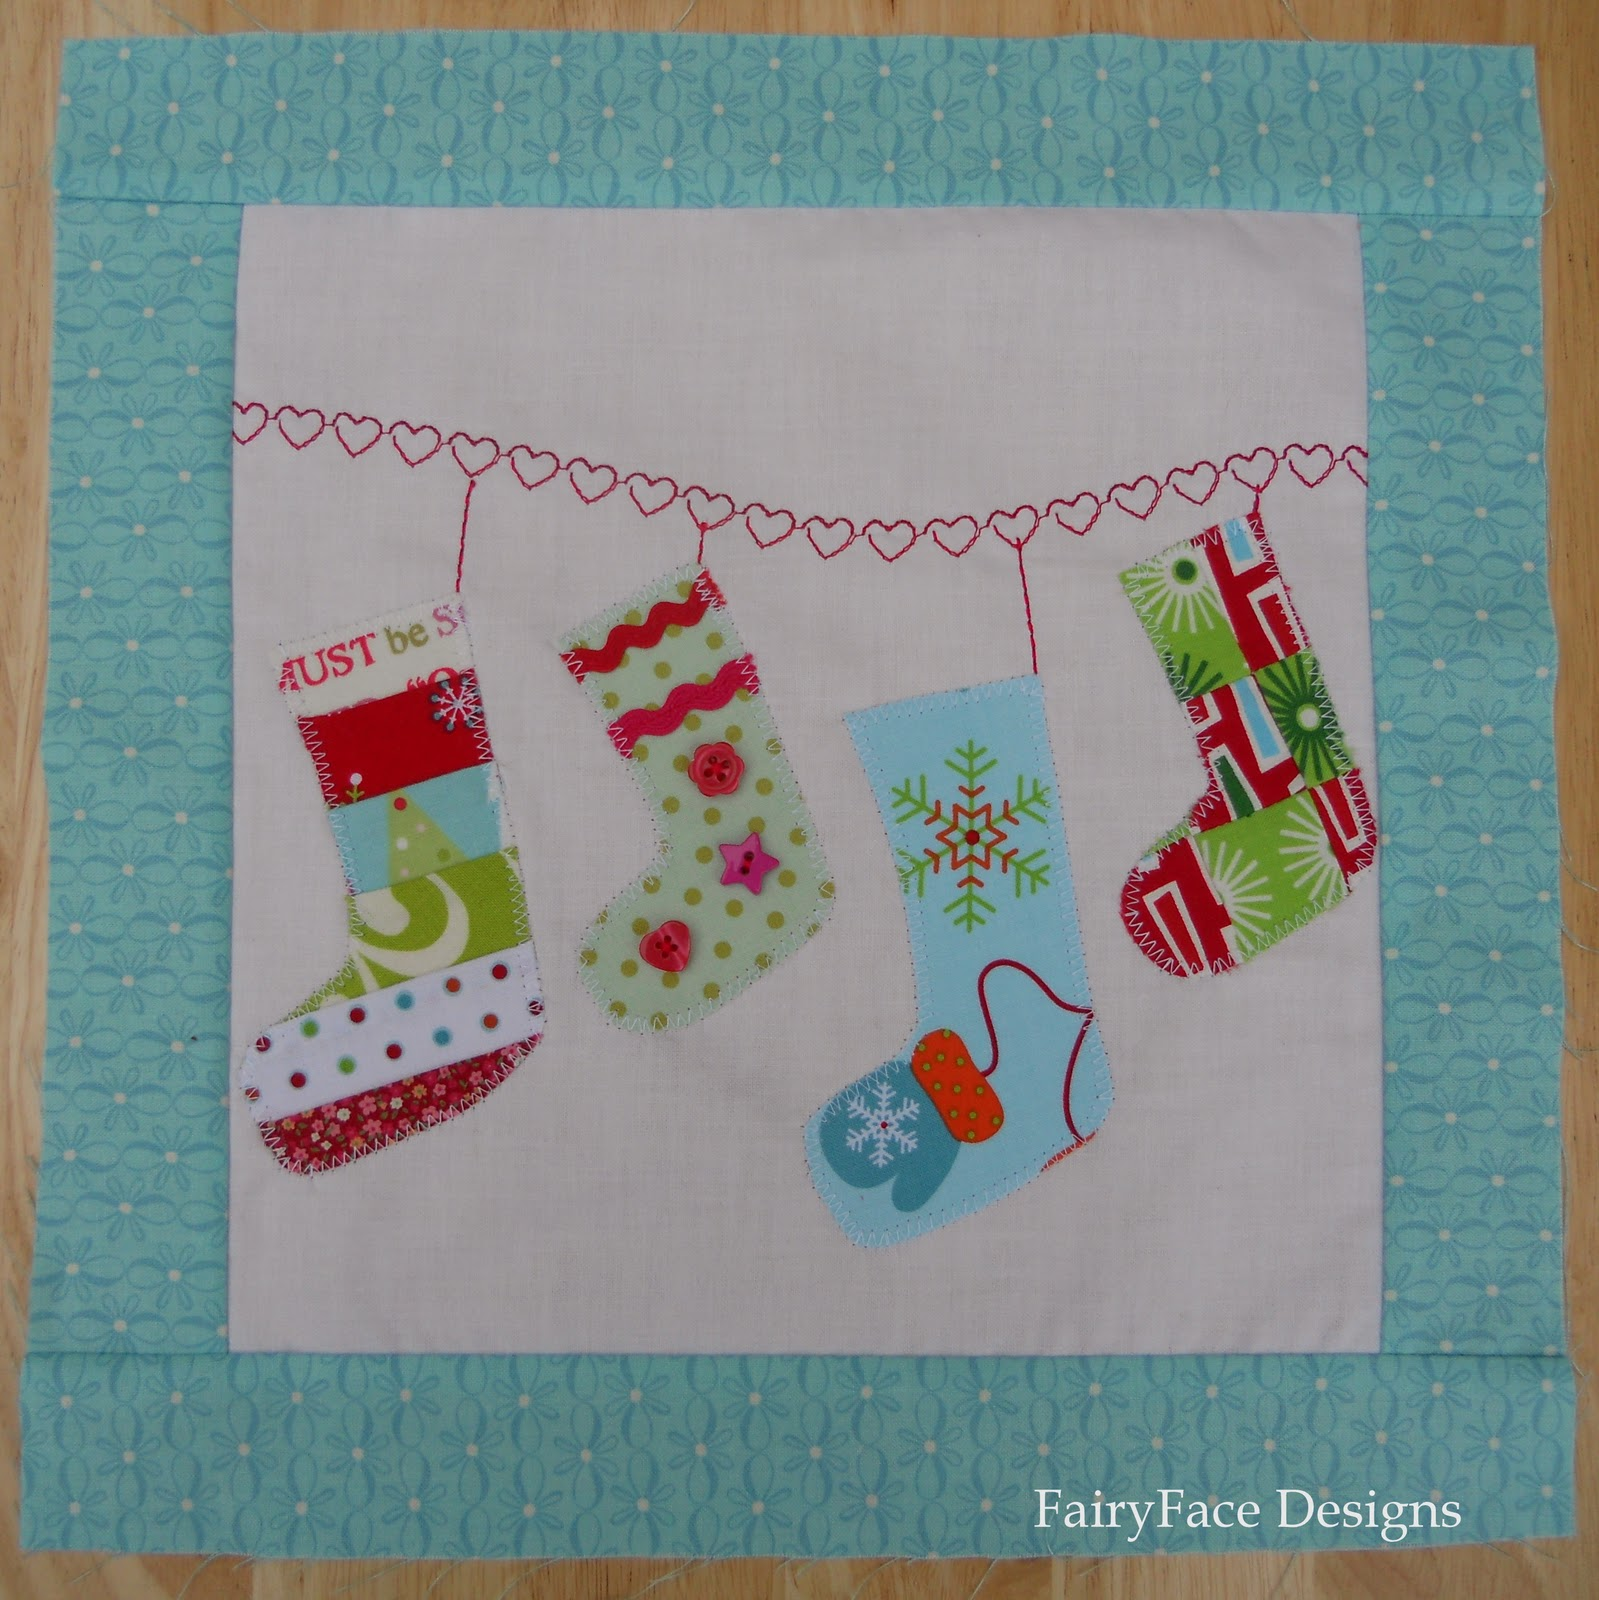 Fairyface Designs Christmas Stockings Block Tutorial